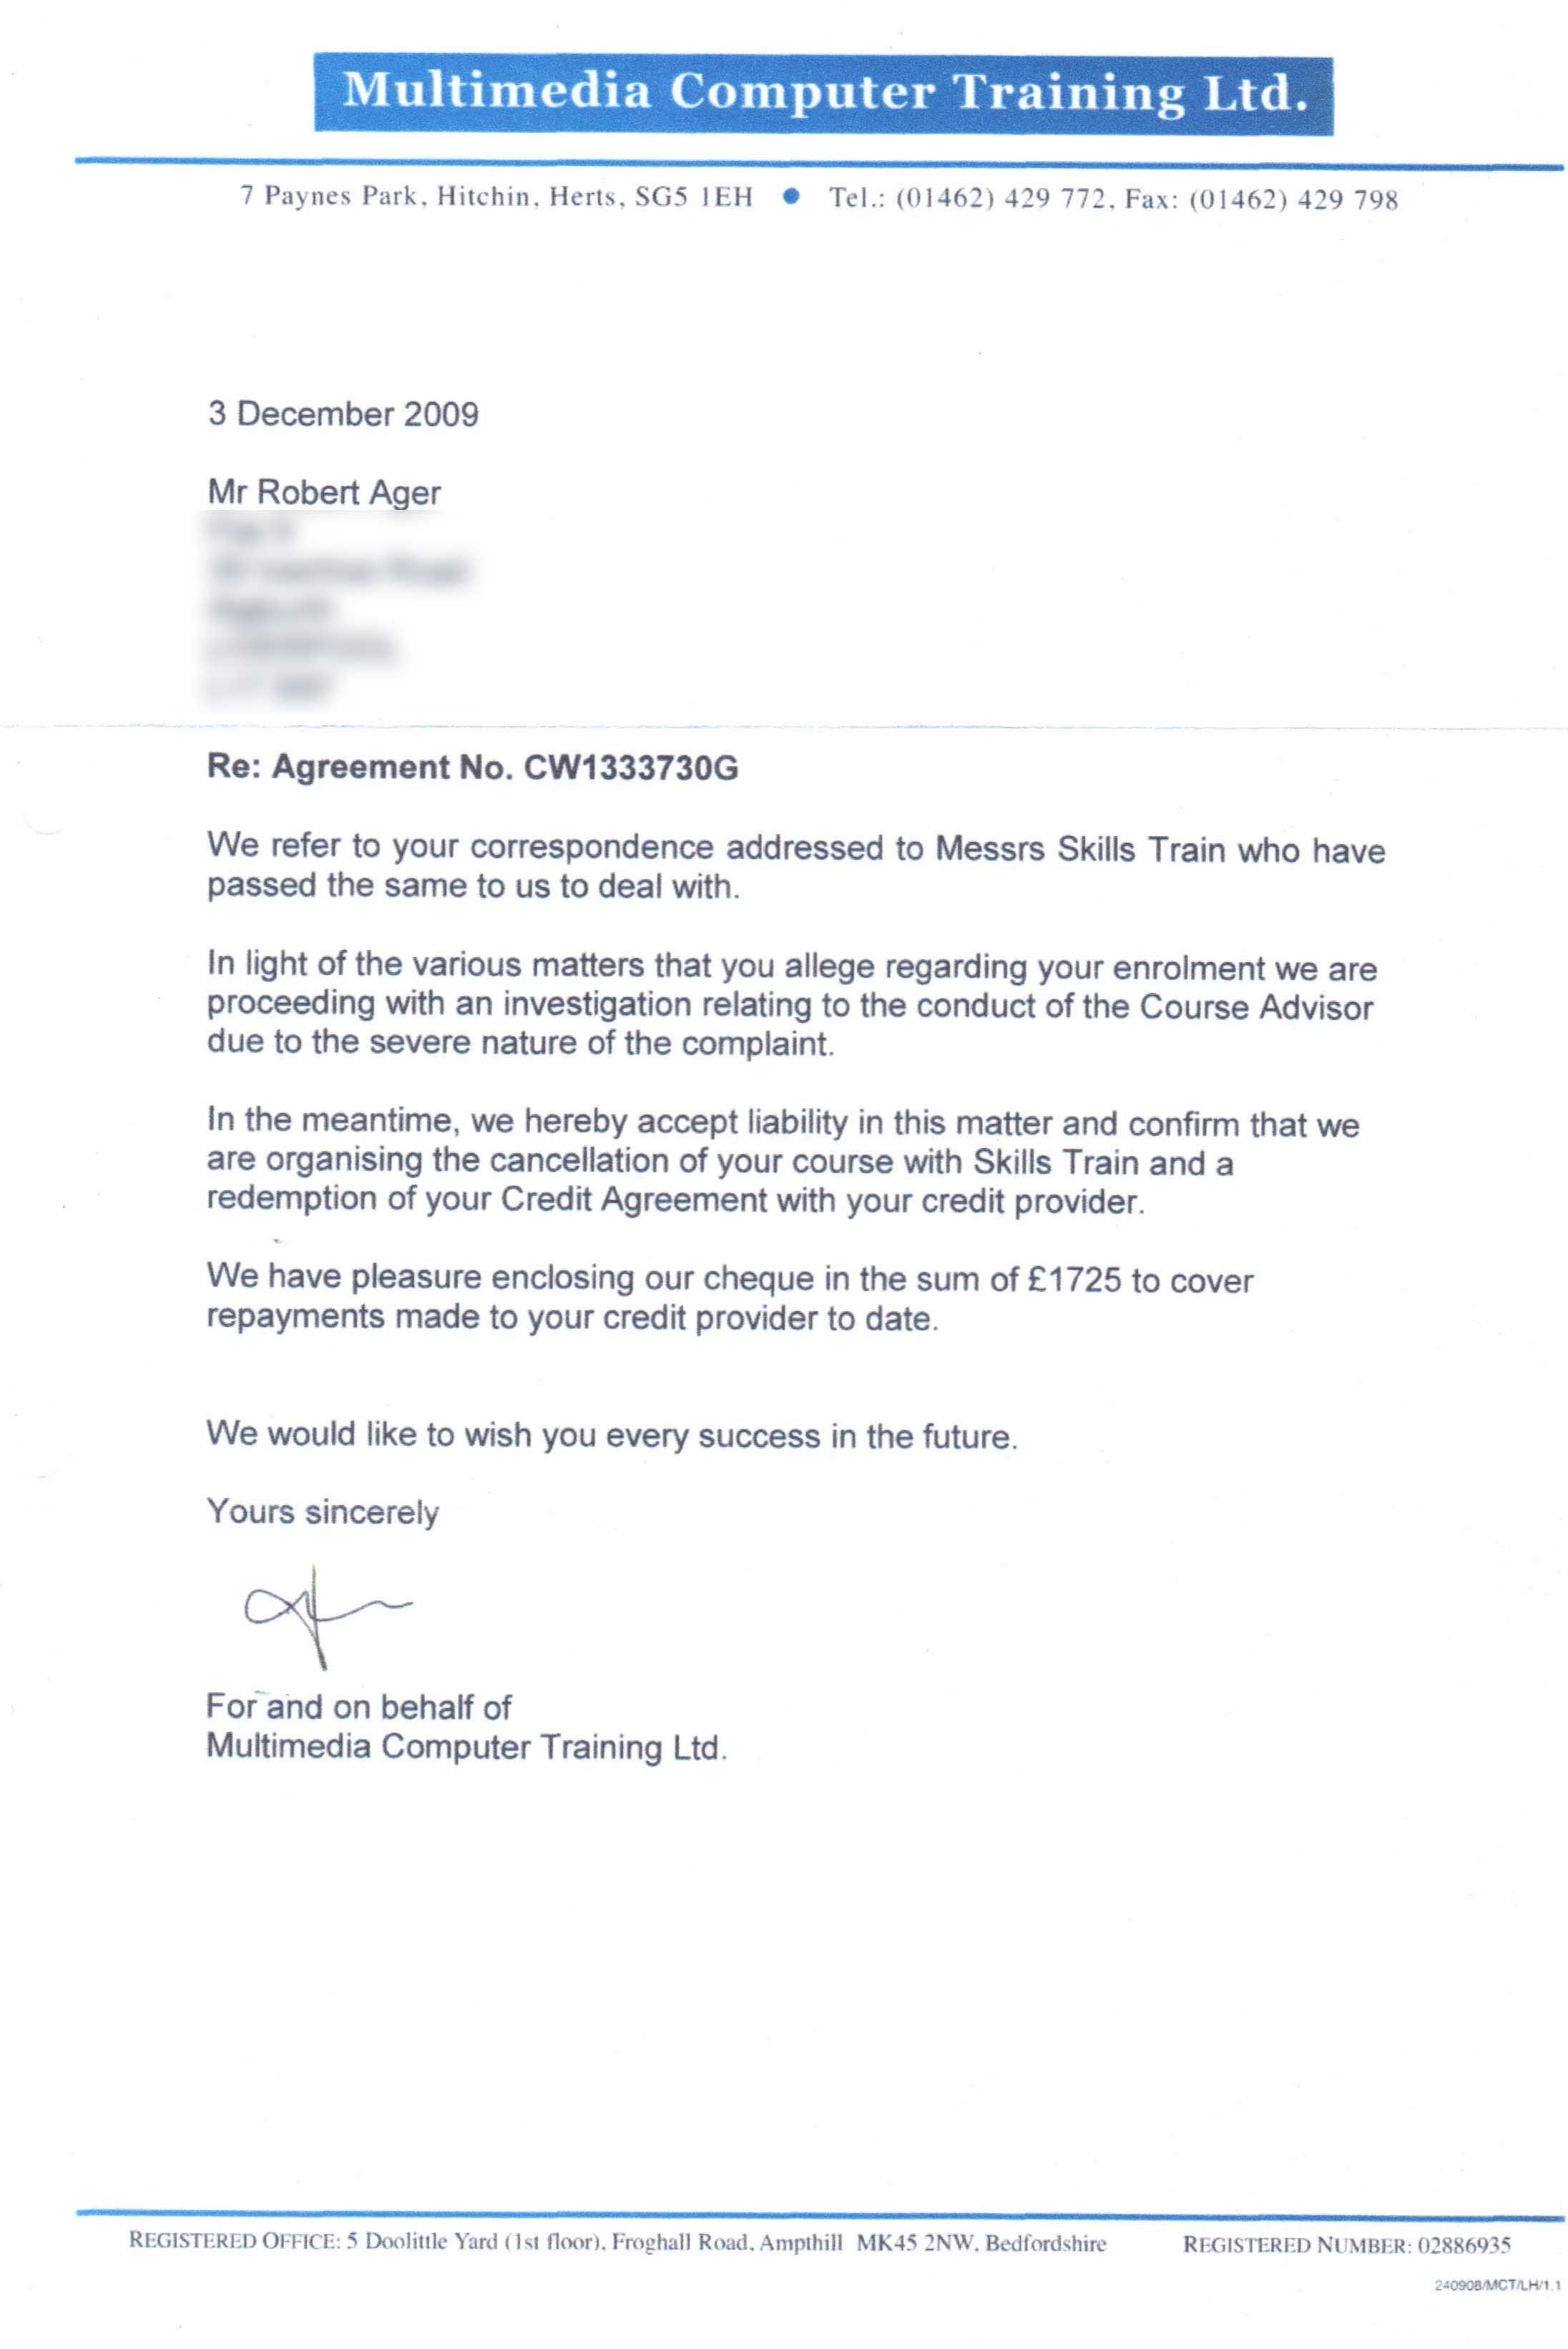 Metropolitan international schools limited information amp metropolitan international schools limited information amp documents irs refund letter template letters sample spiritdancerdesigns Image collections